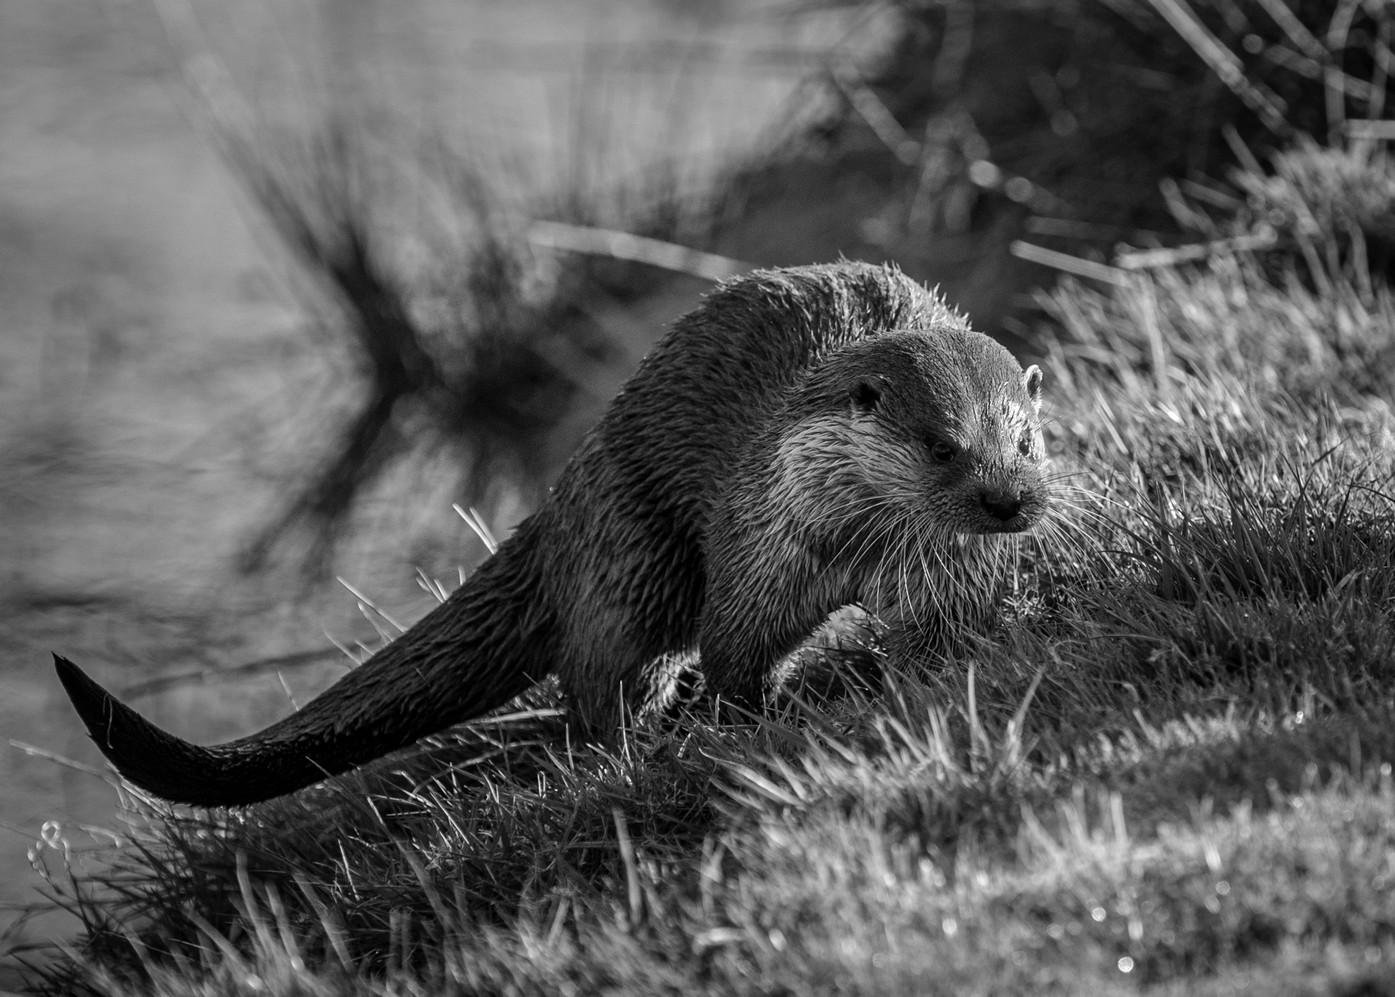 2009.04.04_BWC_British Wildlife Centre_1